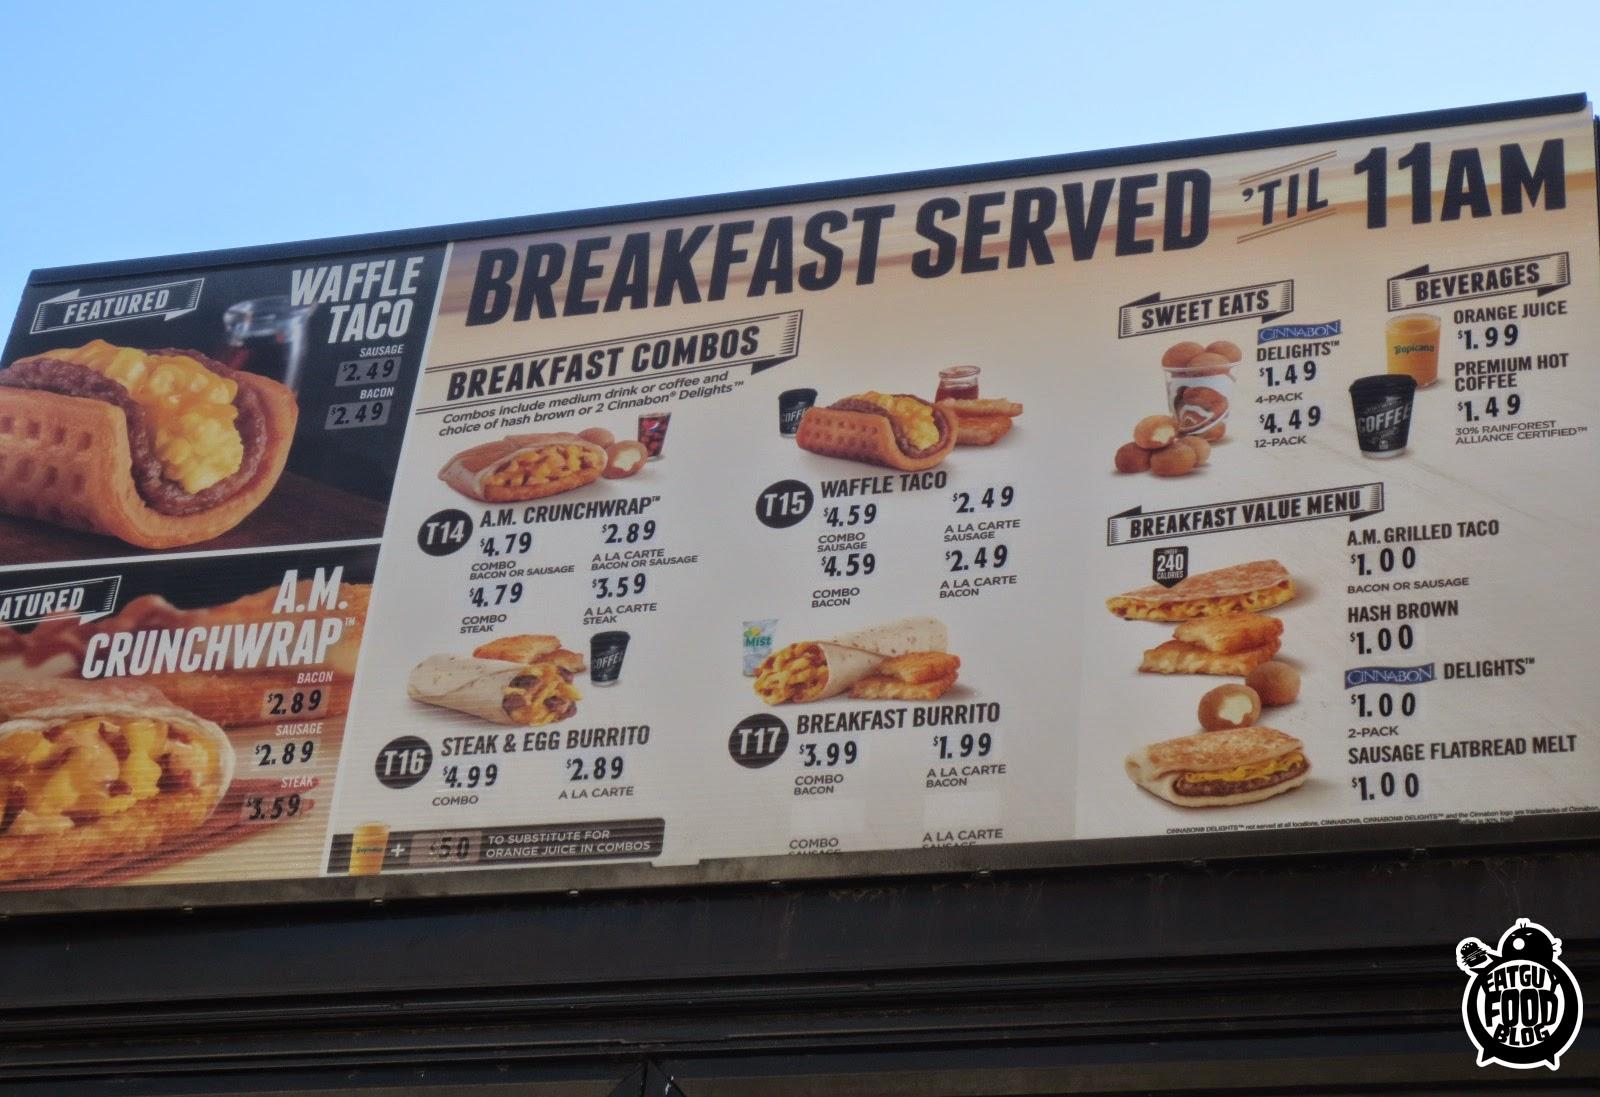 FATGUYFOODBLOG: Taco Bell Breakfast Menu Part 1: The A.M ...  Taco